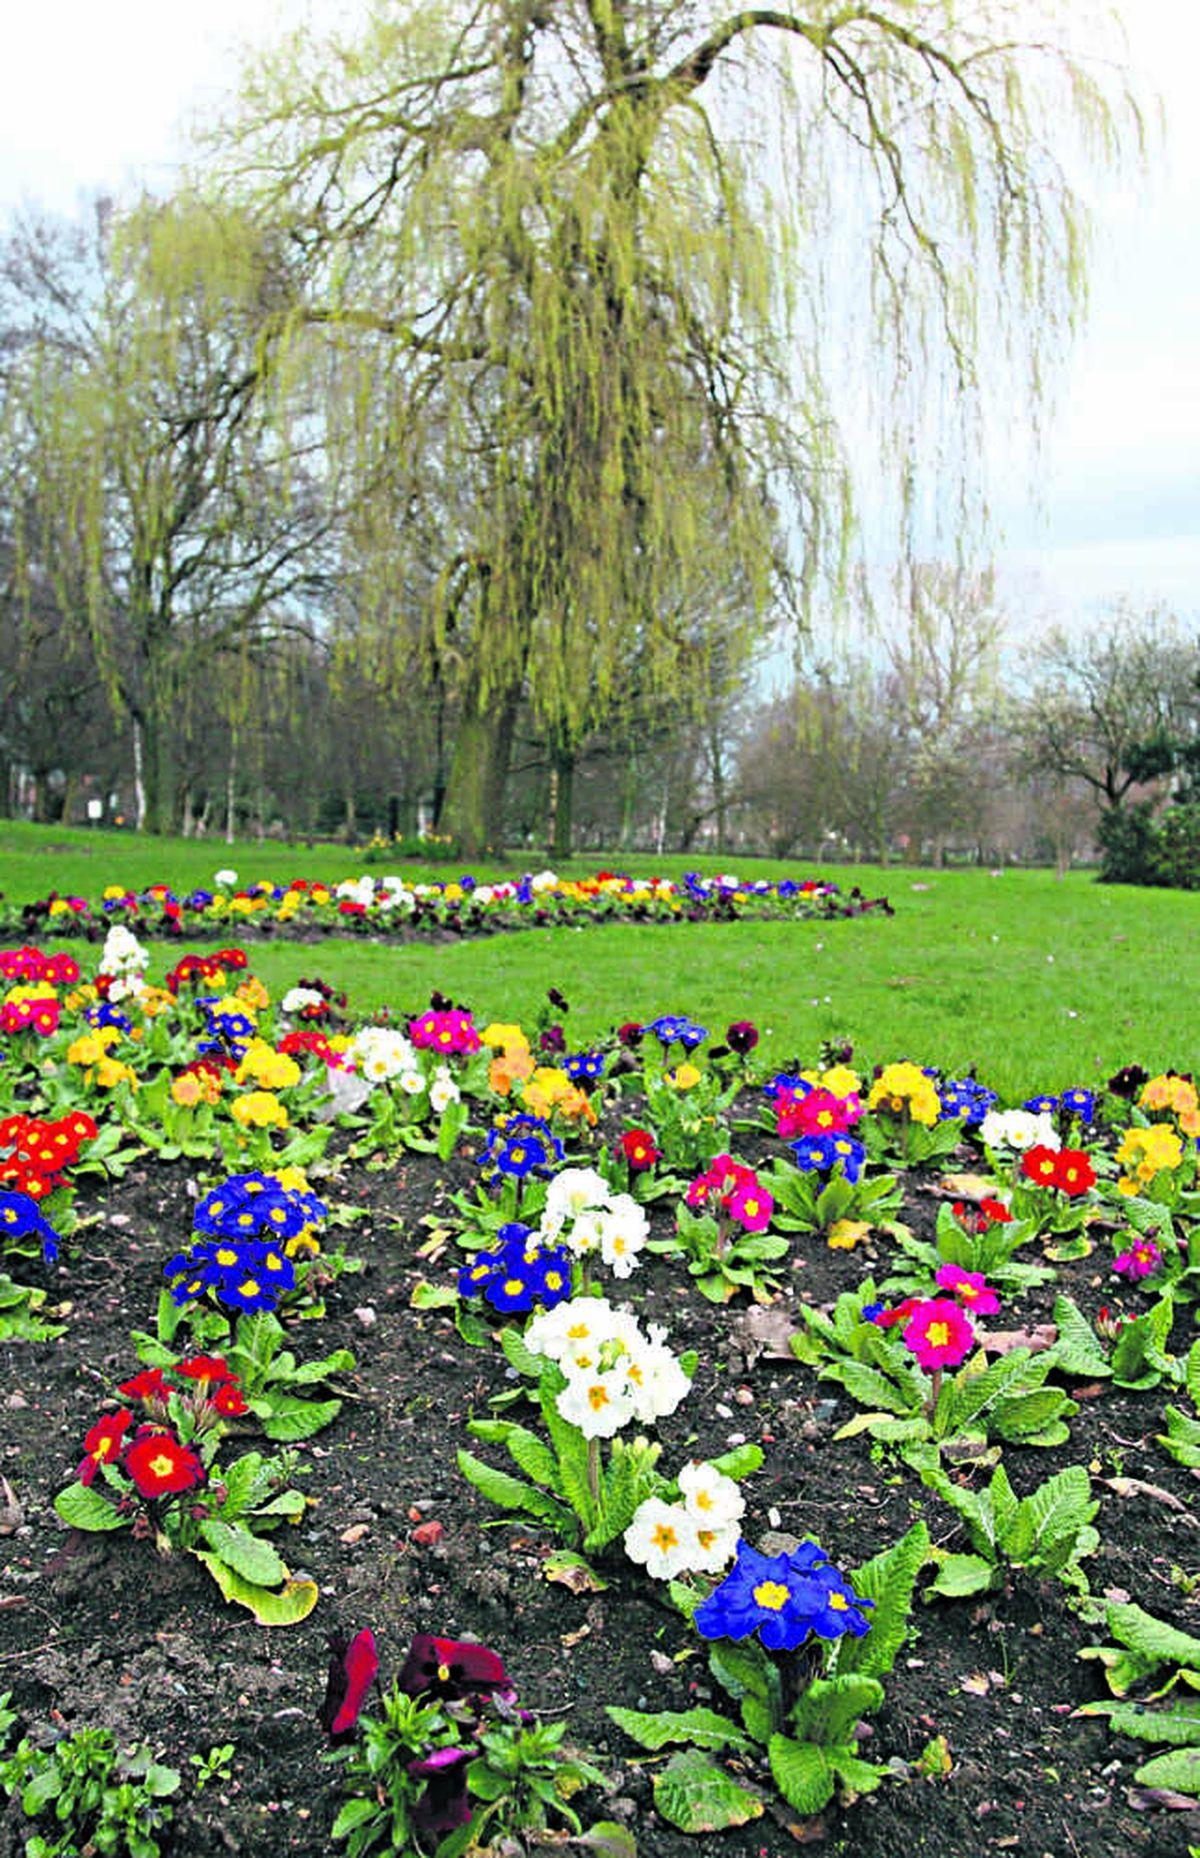 Brunswick Park will enjoy a birthday bash